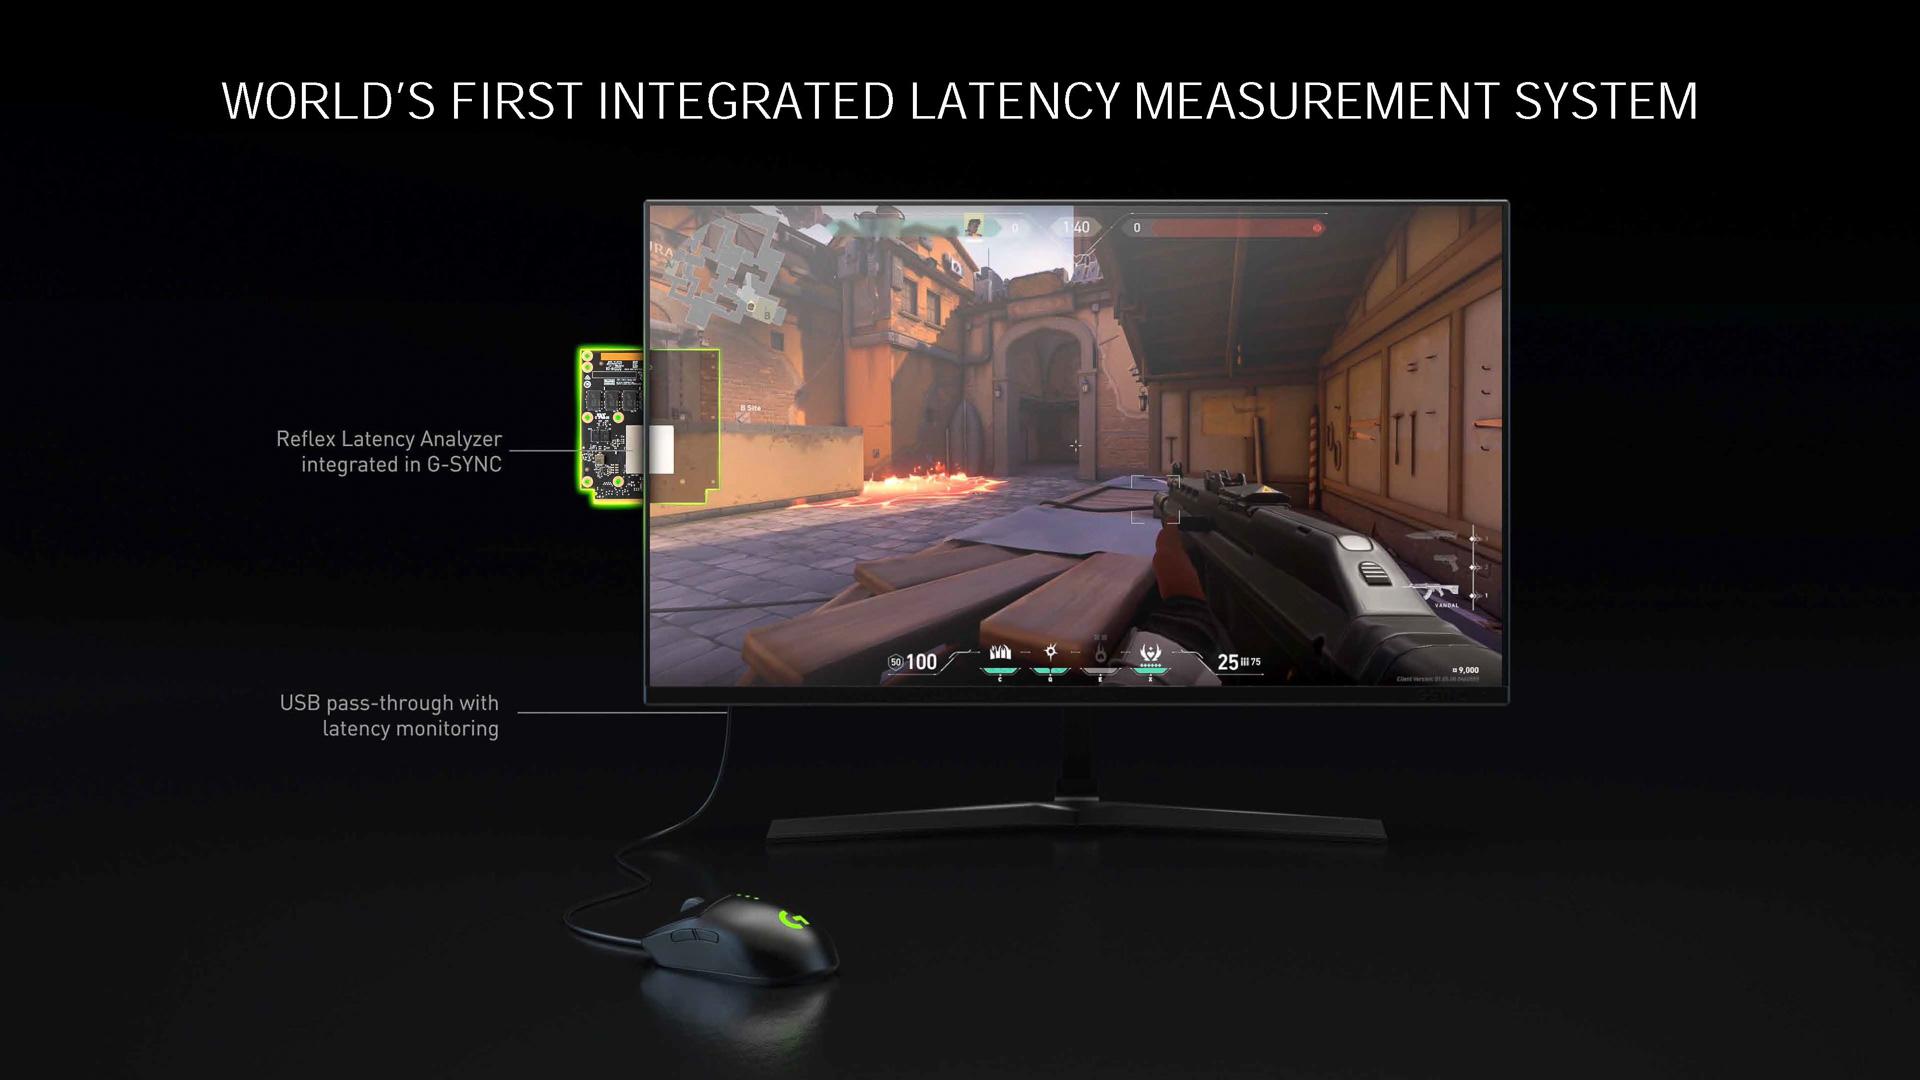 NVIDIA Reflex Latency Analyzer」の基板を組み込んだモニターが今後出荷される